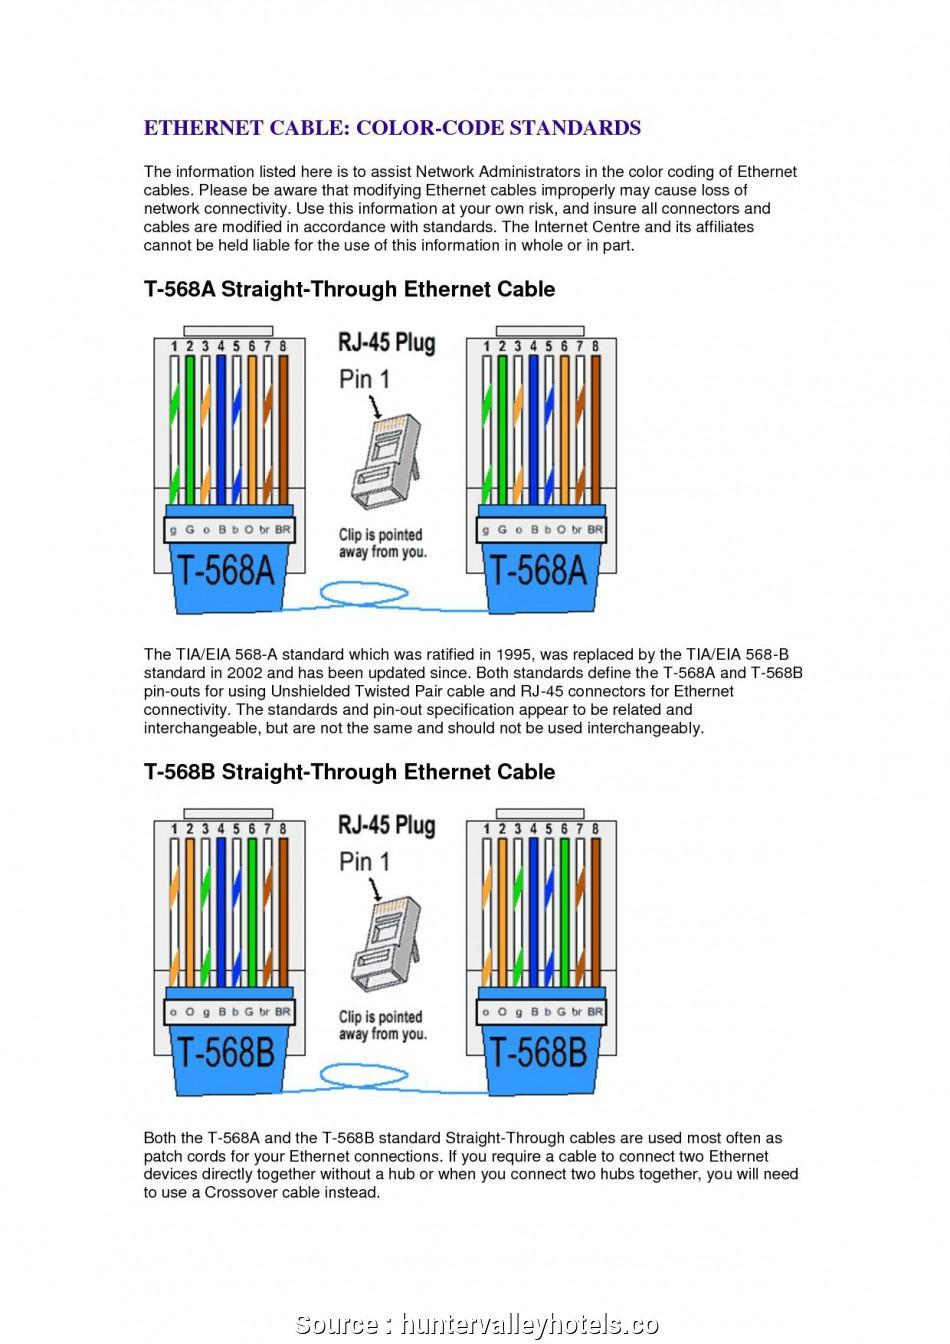 Rj45 Wiring Diagram T568B | Wiring Library - T568B Wiring Diagram